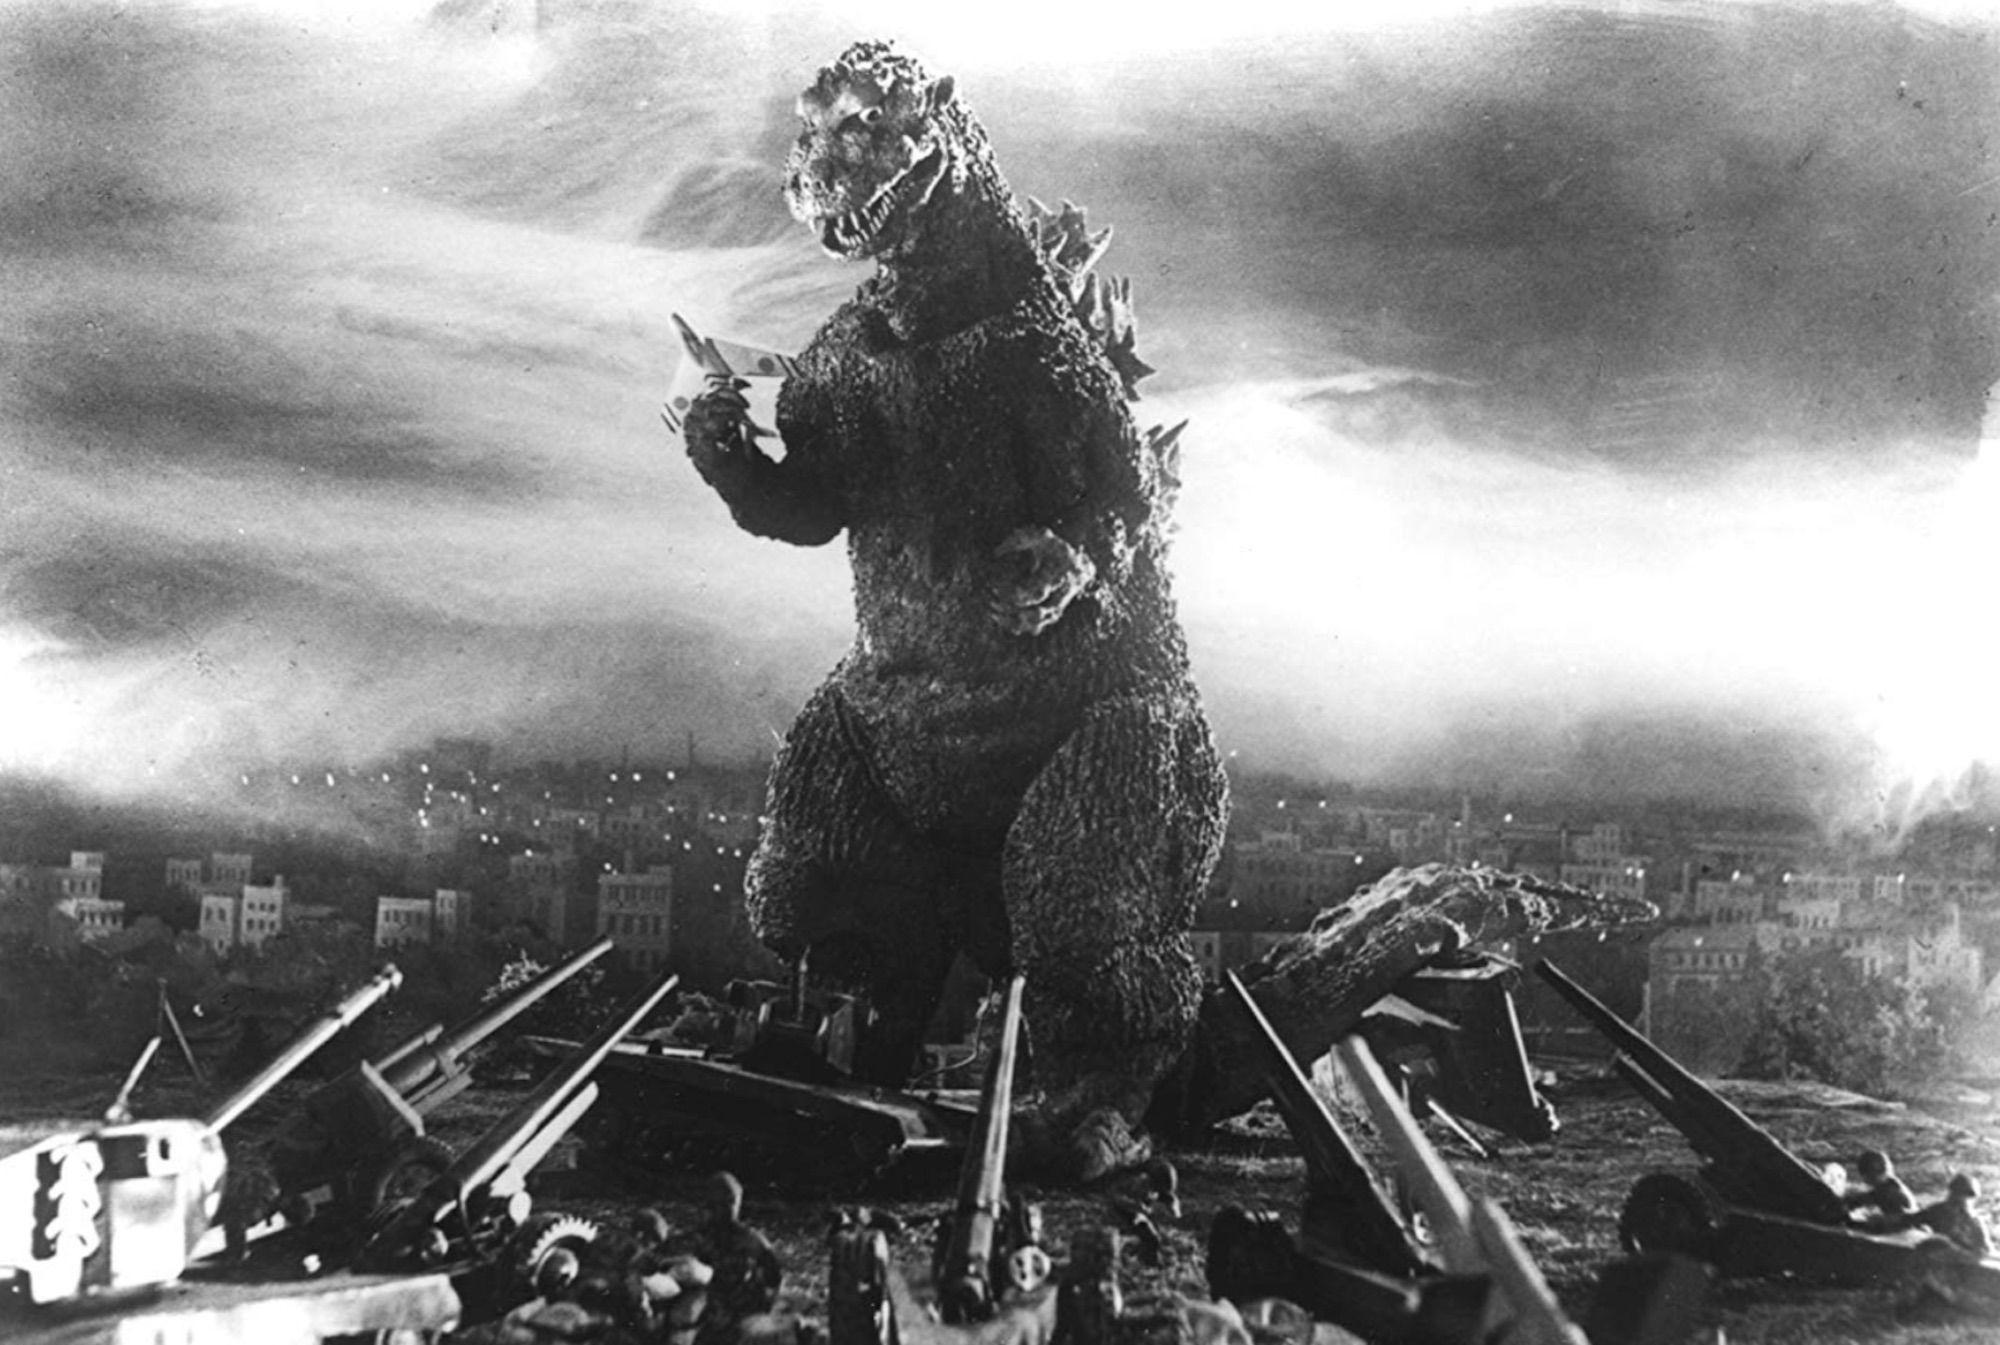 af9bc6f2a726 25 Fun Facts About Godzilla | Mental Floss